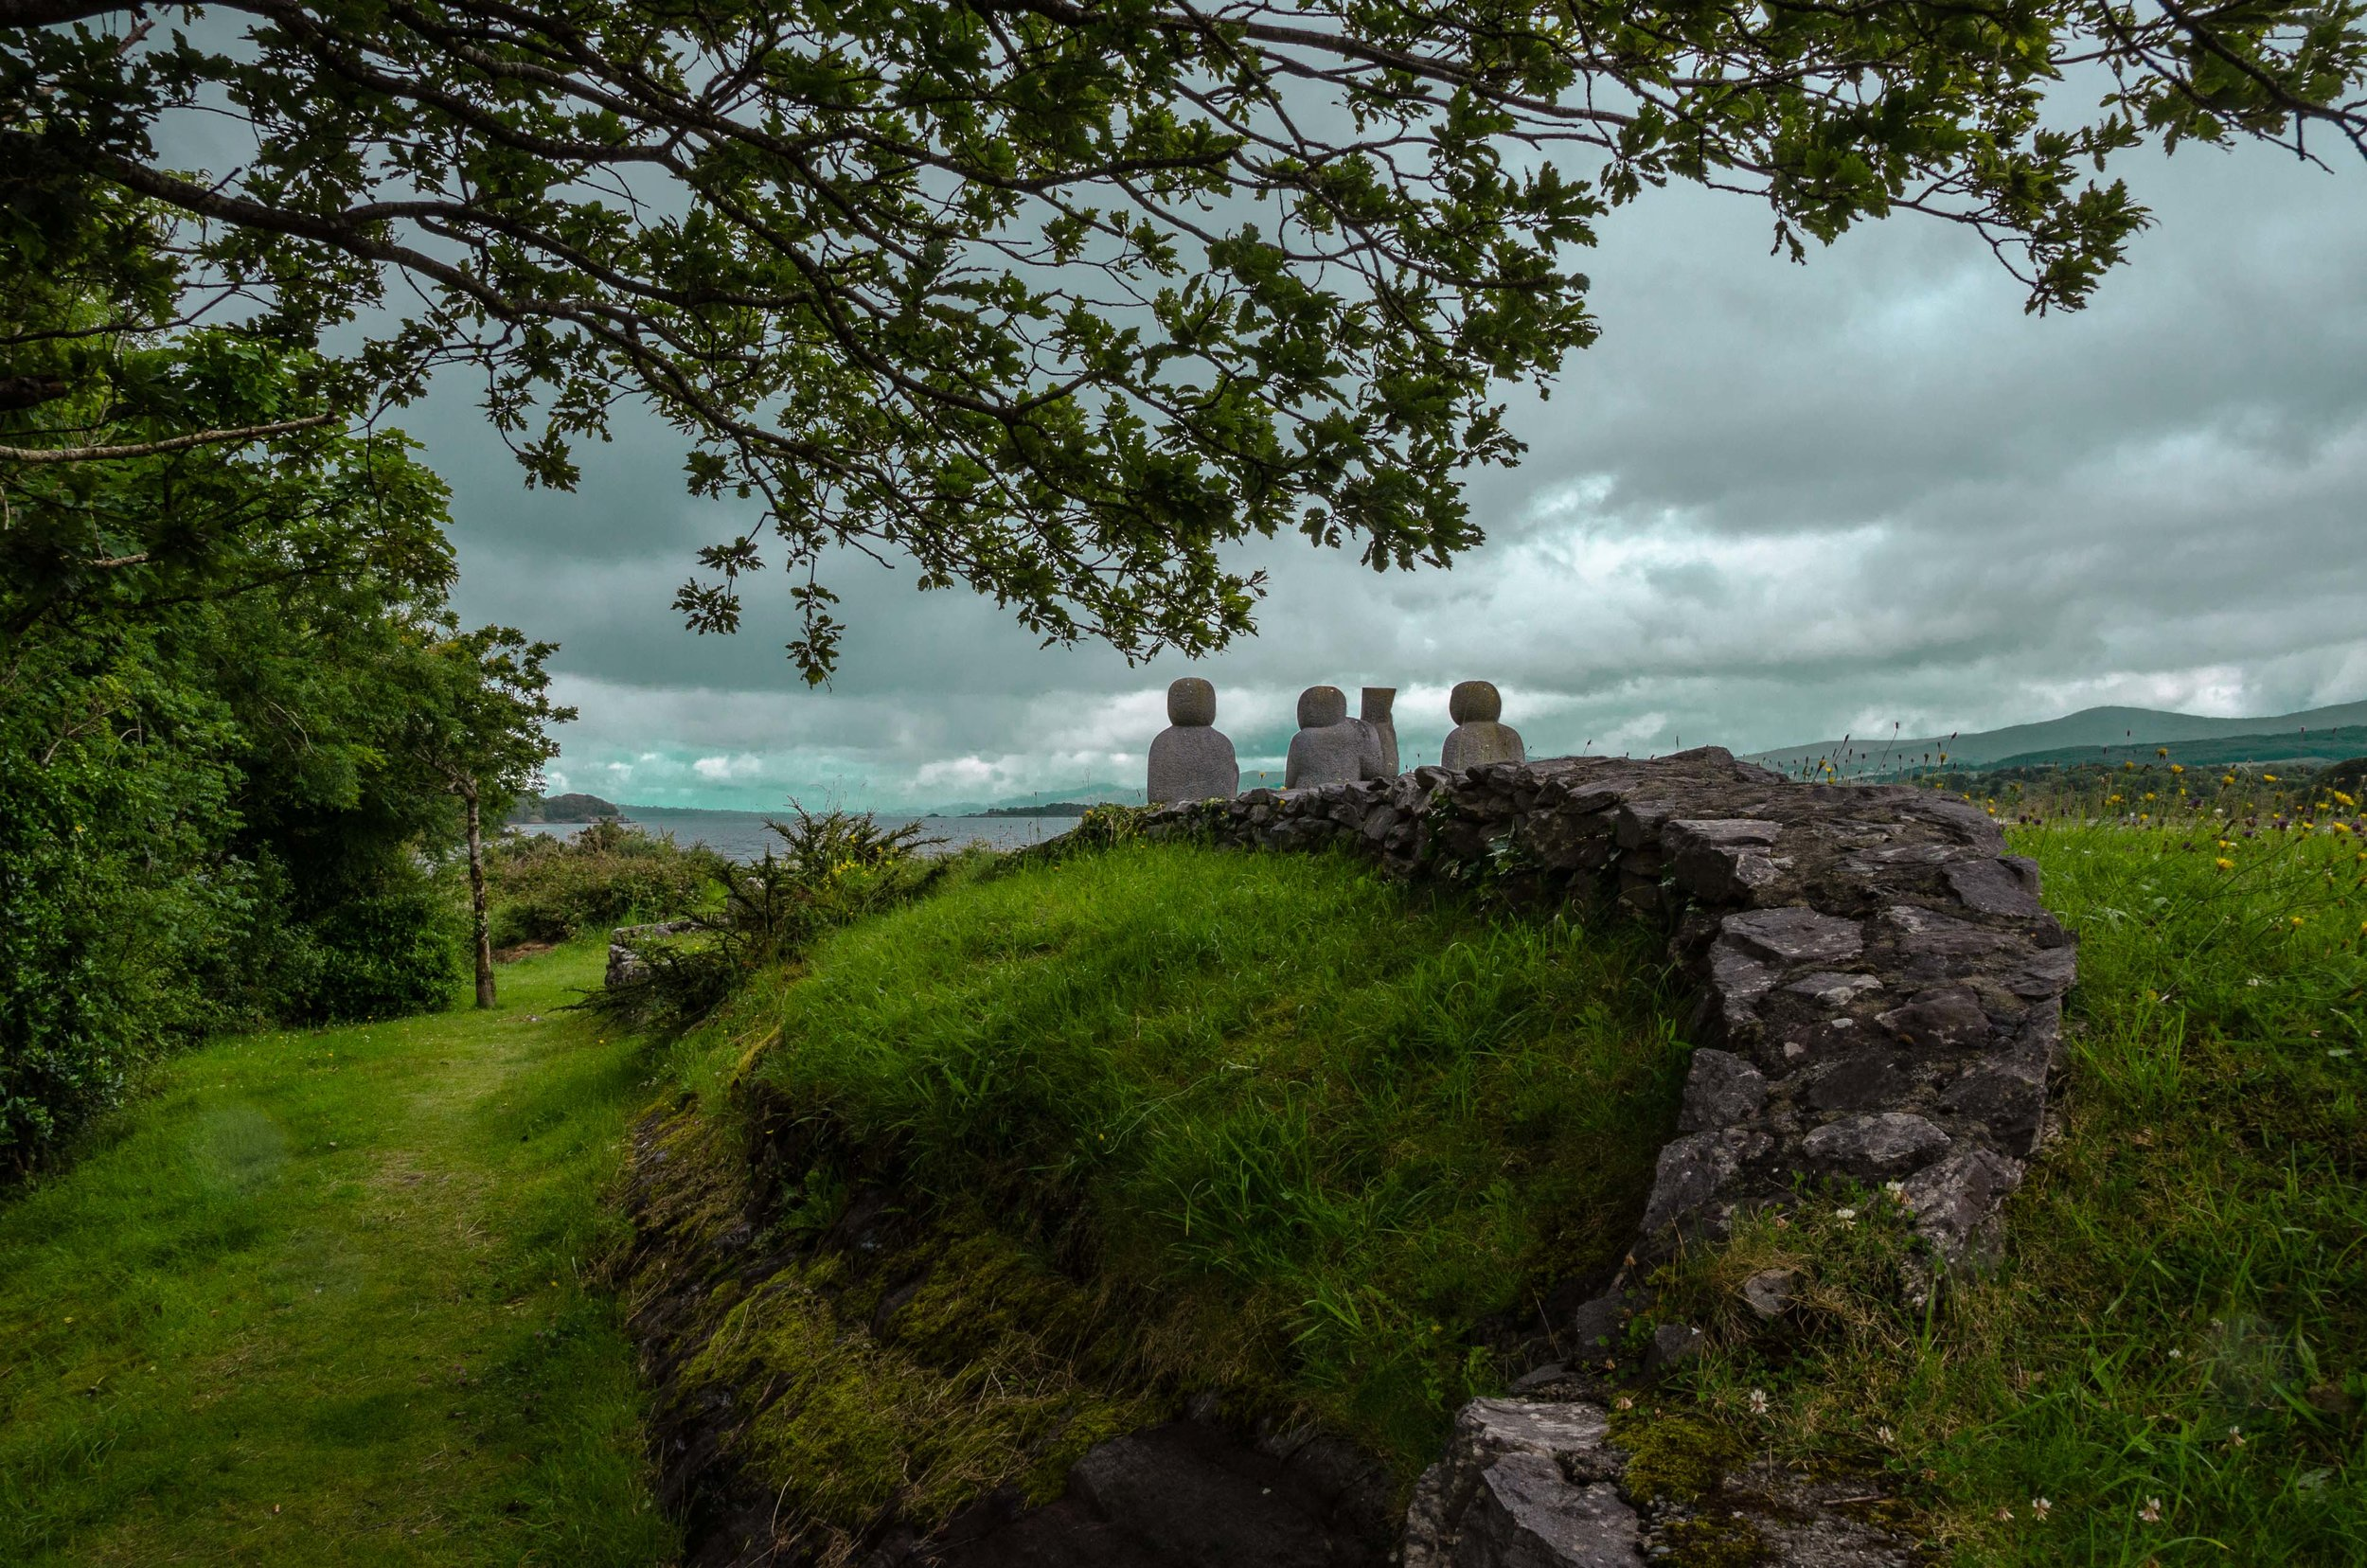 The Three Musicians. Kenmare, Ireland 2015